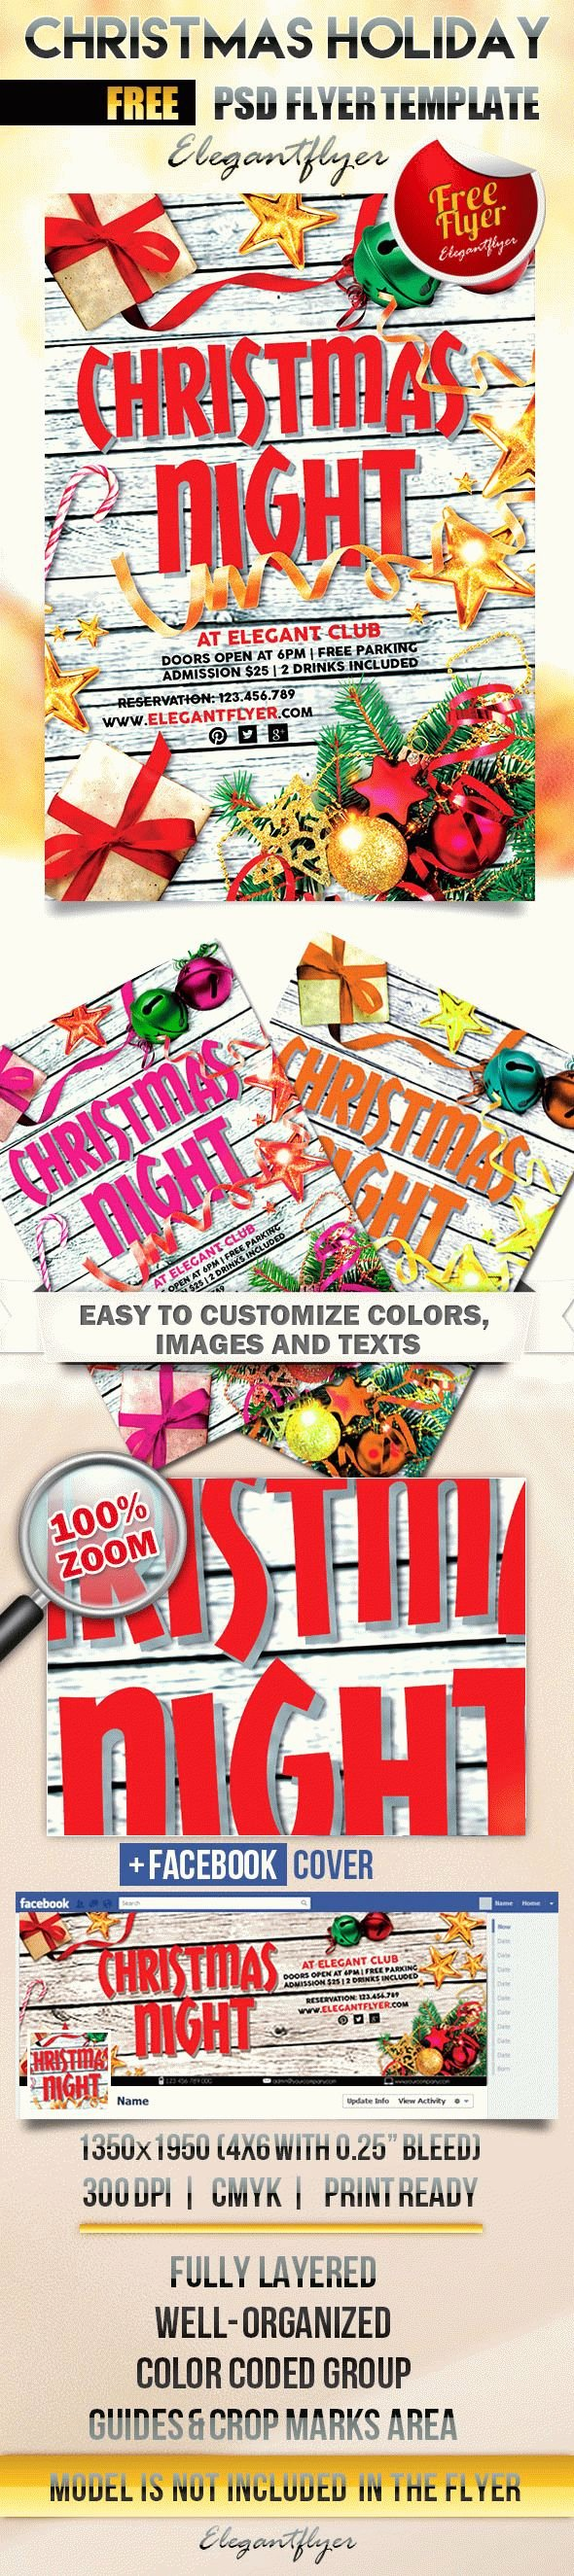 Christmas Flyer Template Free Inspirational Christmas Holiday – Free Flyer Psd Template – by Elegantflyer